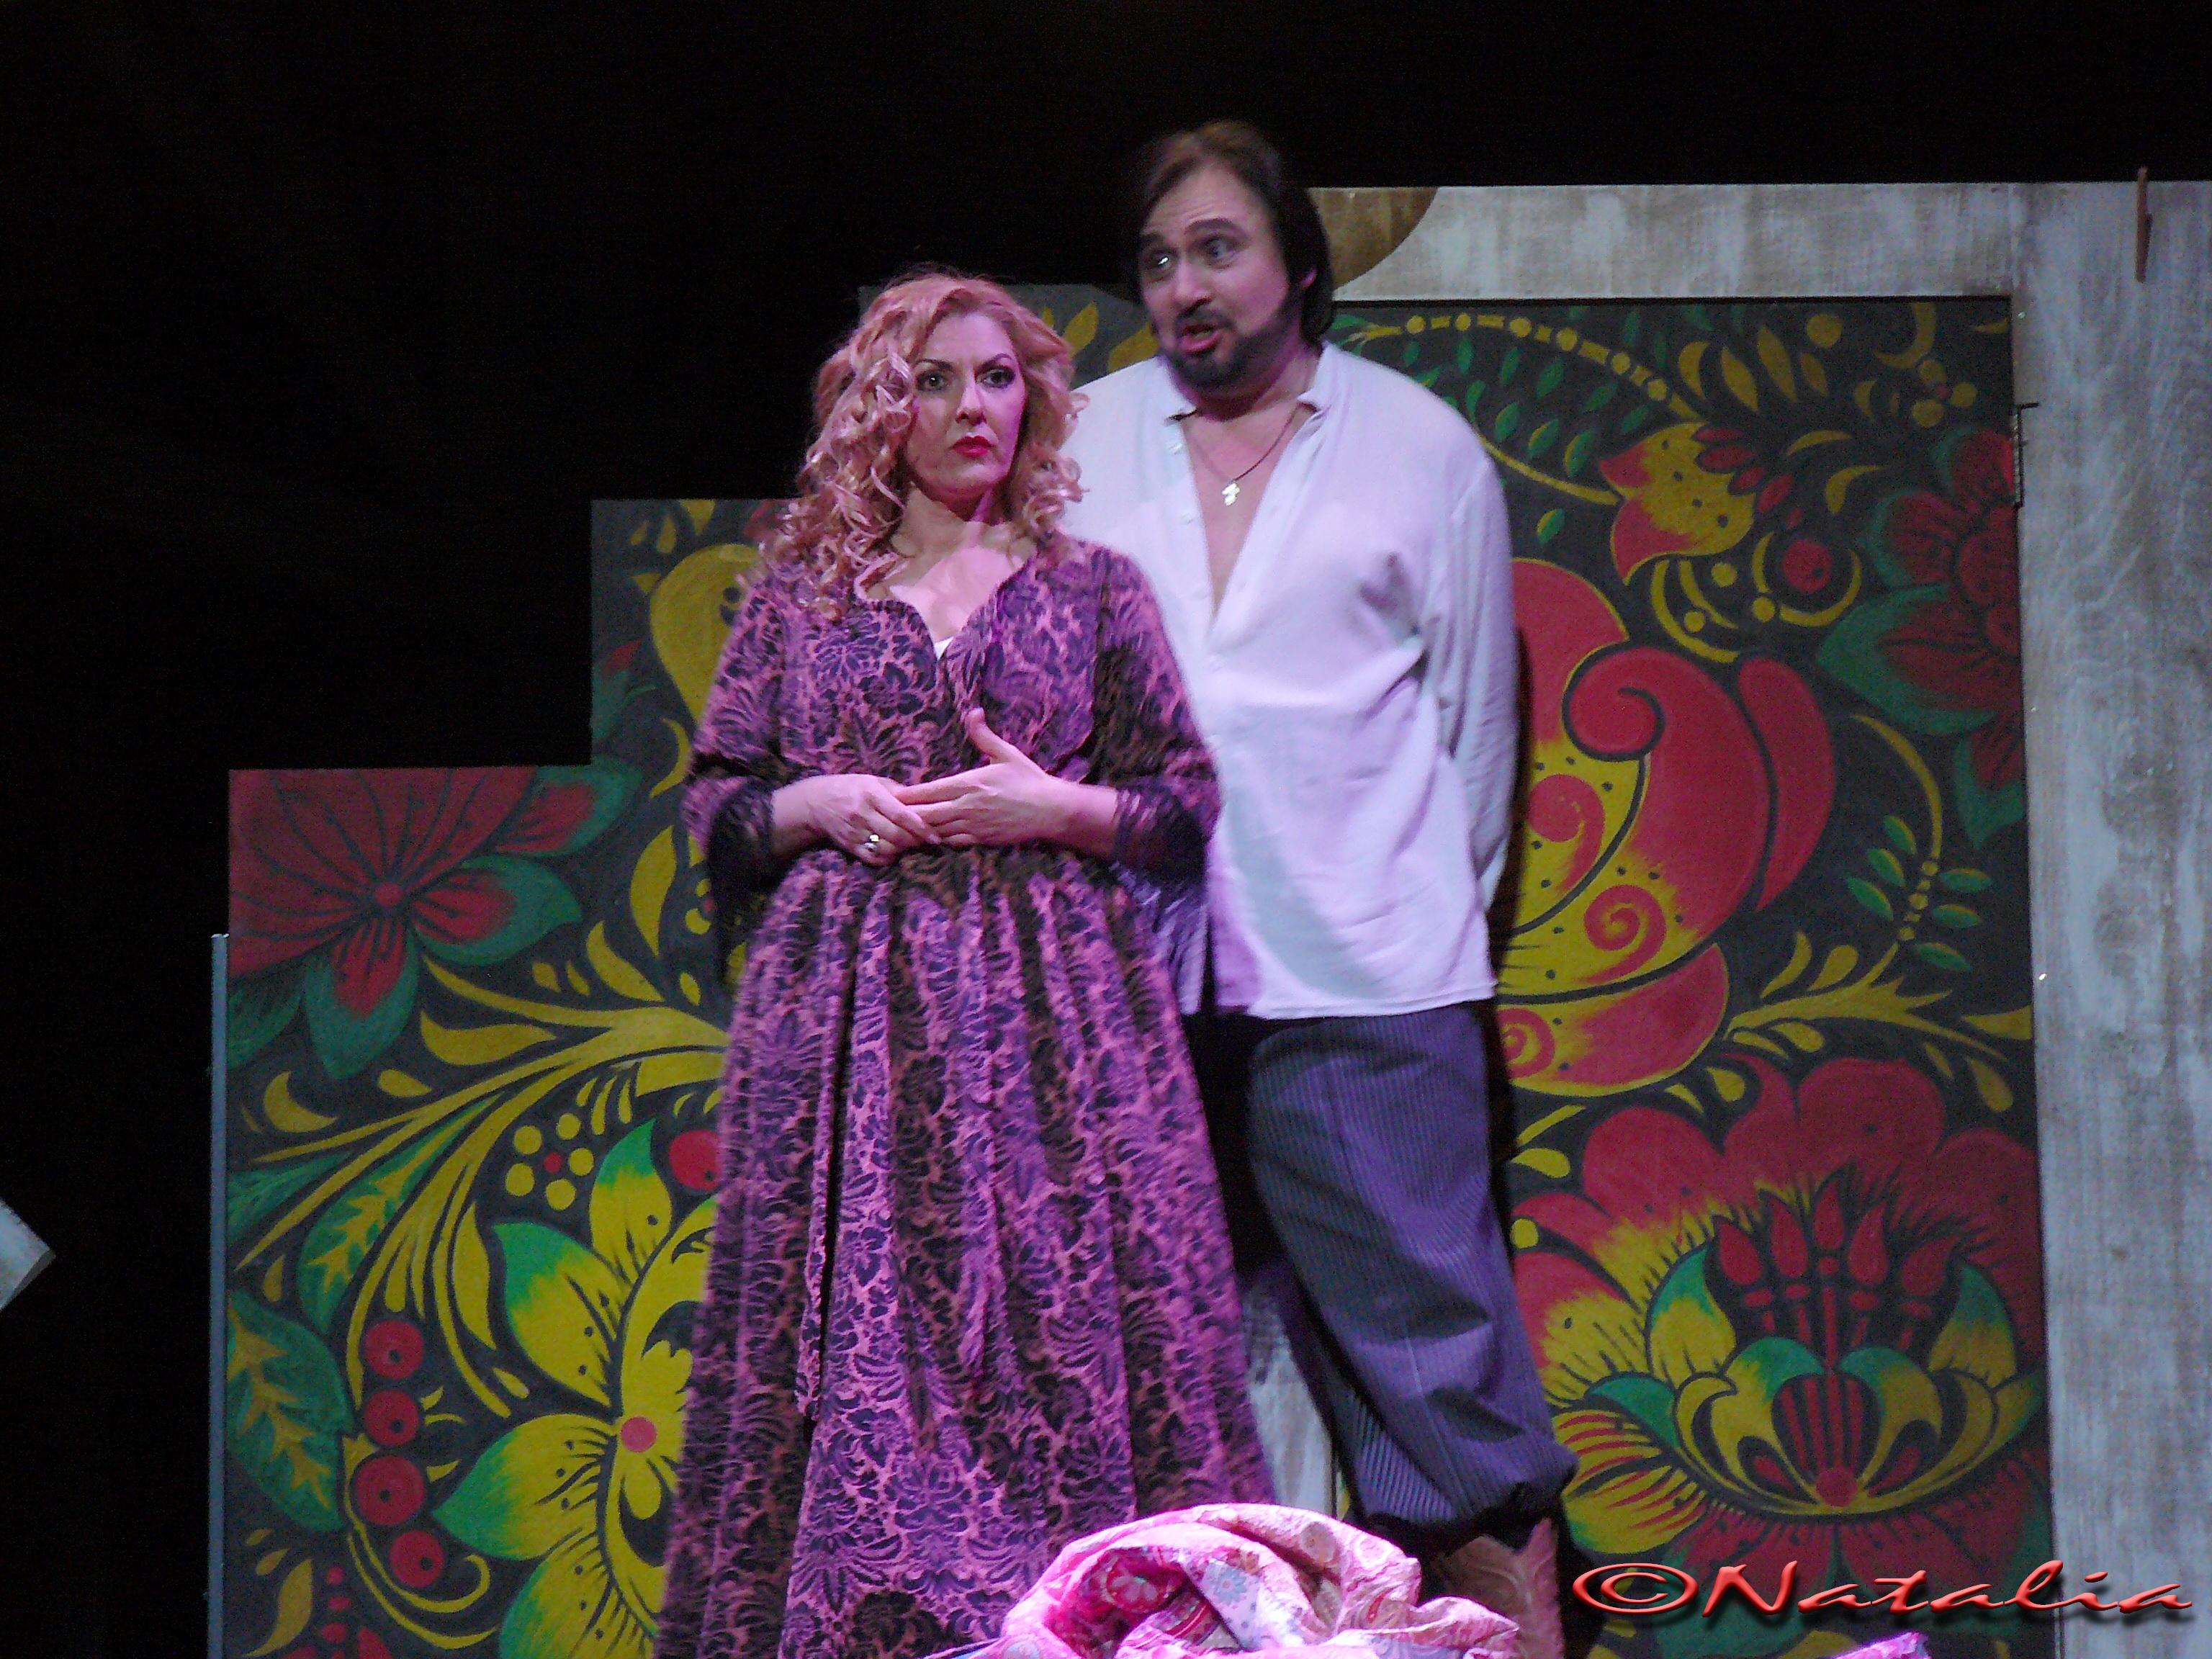 Lady Macbeth of the Mtsensk_Ostrava